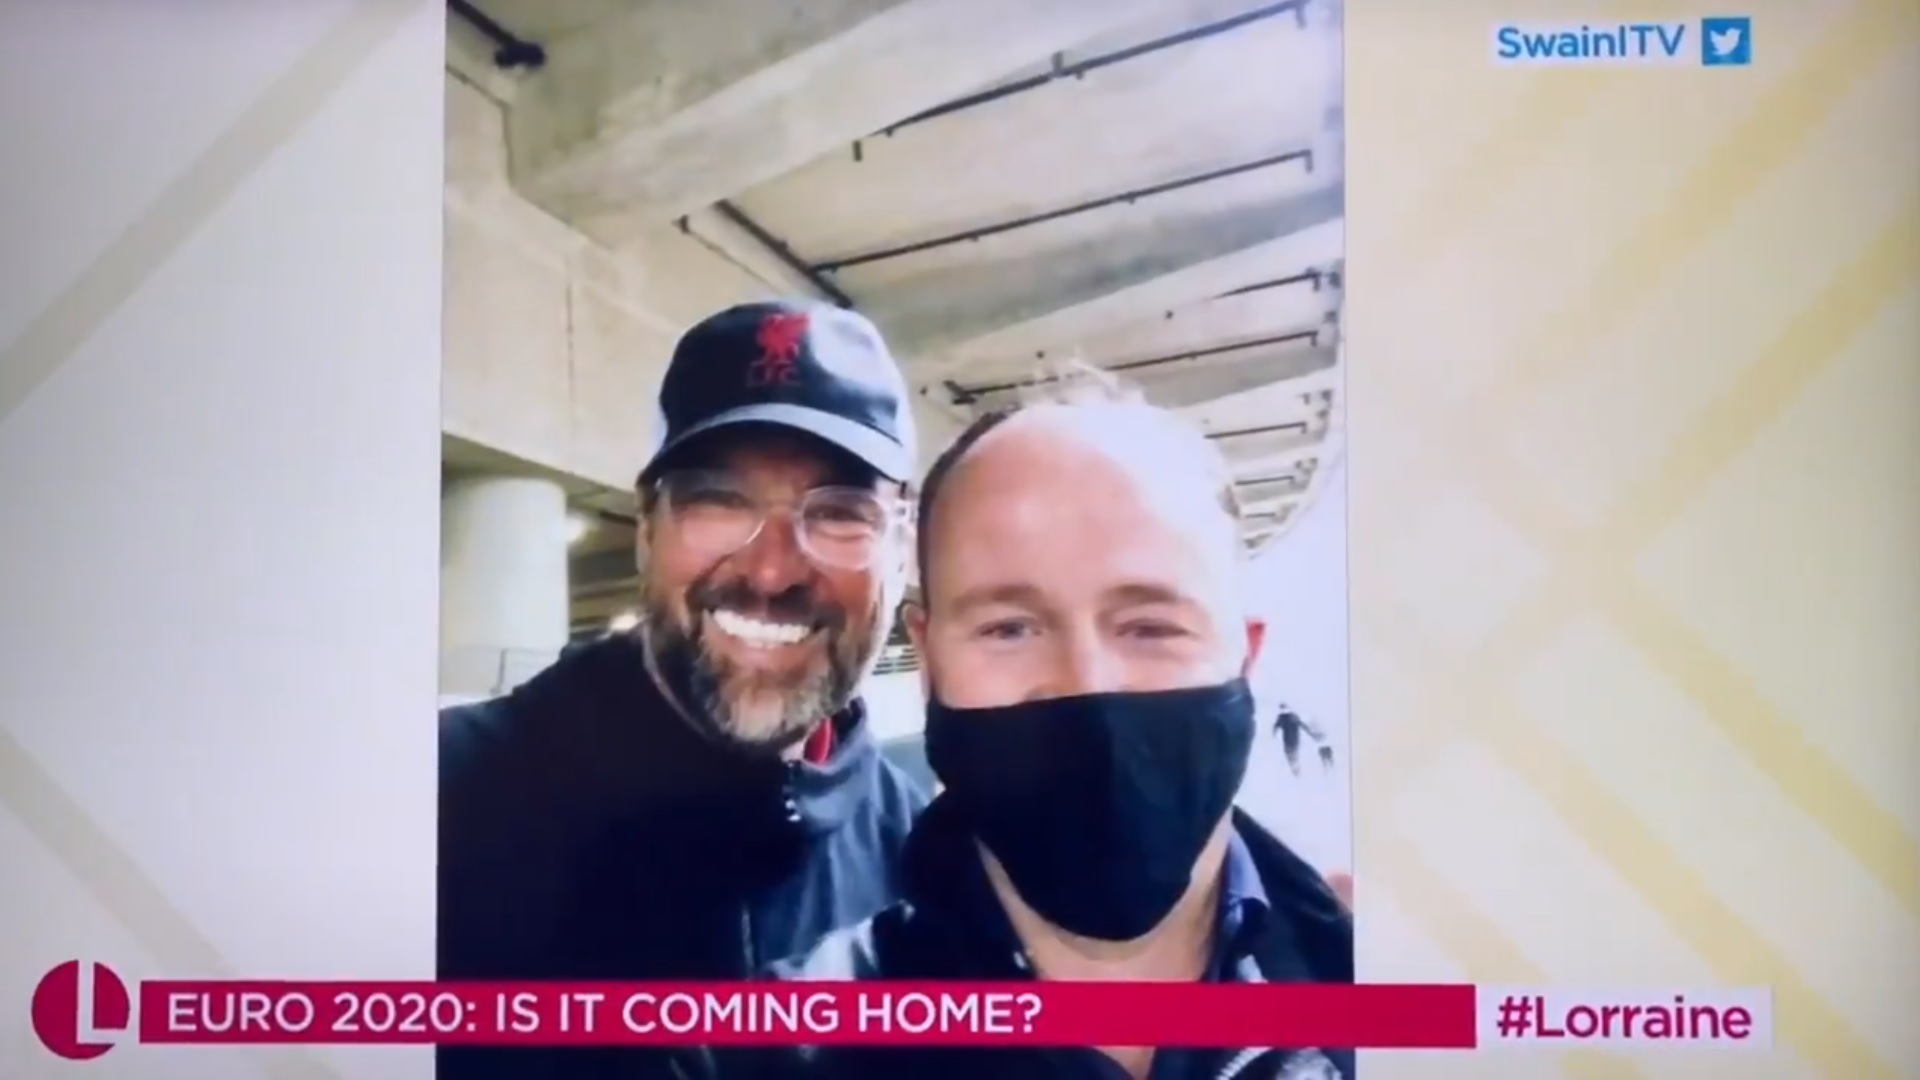 (Video) Ridiculous: ITV reporter reckons Jurgen Klopp was getting drunk outside Wembley on England fan's shoulders – but he's had an absolute stinker